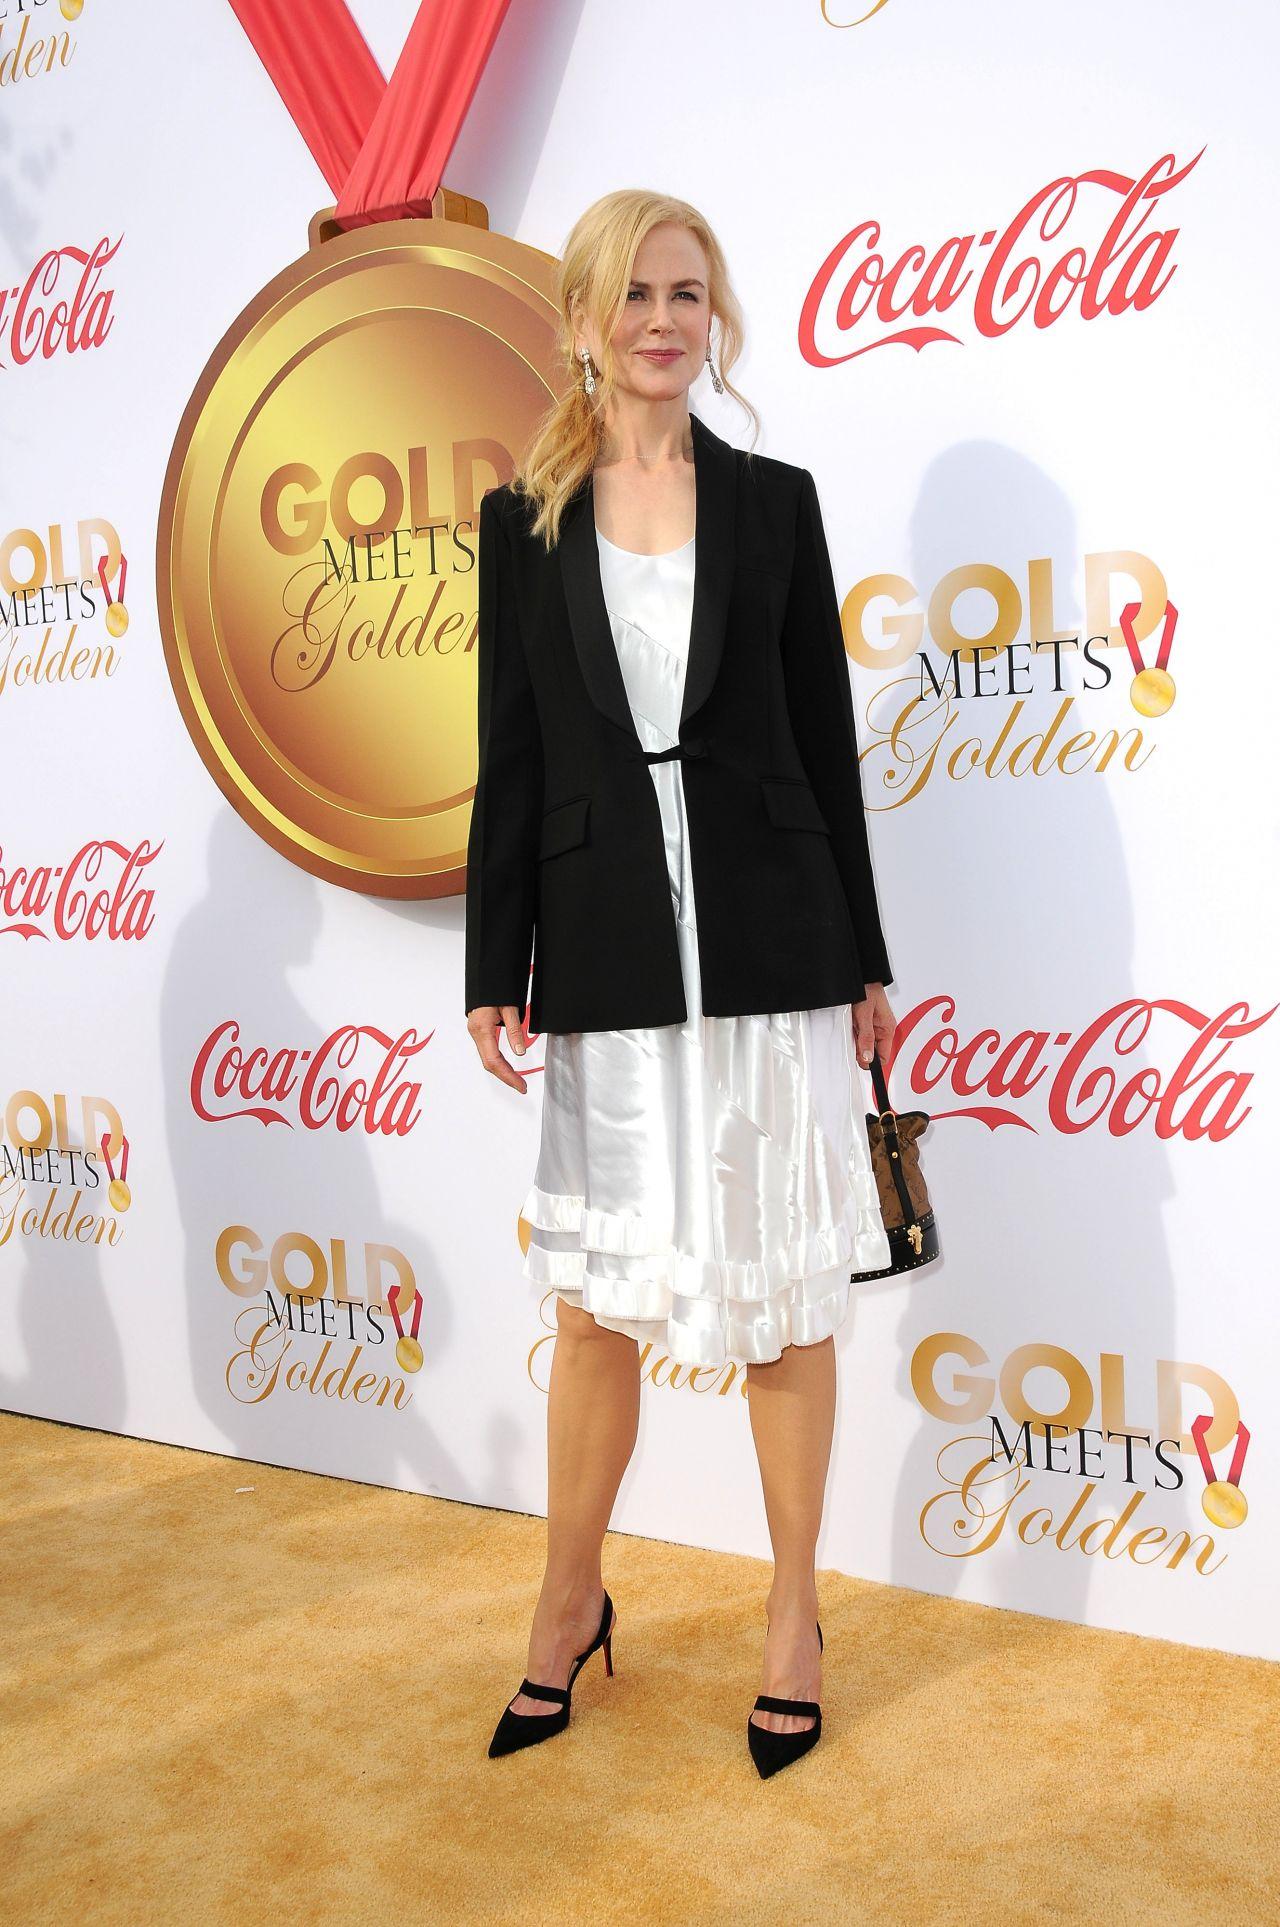 http://celebmafia.com/wp-content/uploads/2018/01/nicole-kidman-gold-meets-golden-awards-in-los-angeles-6.jpg